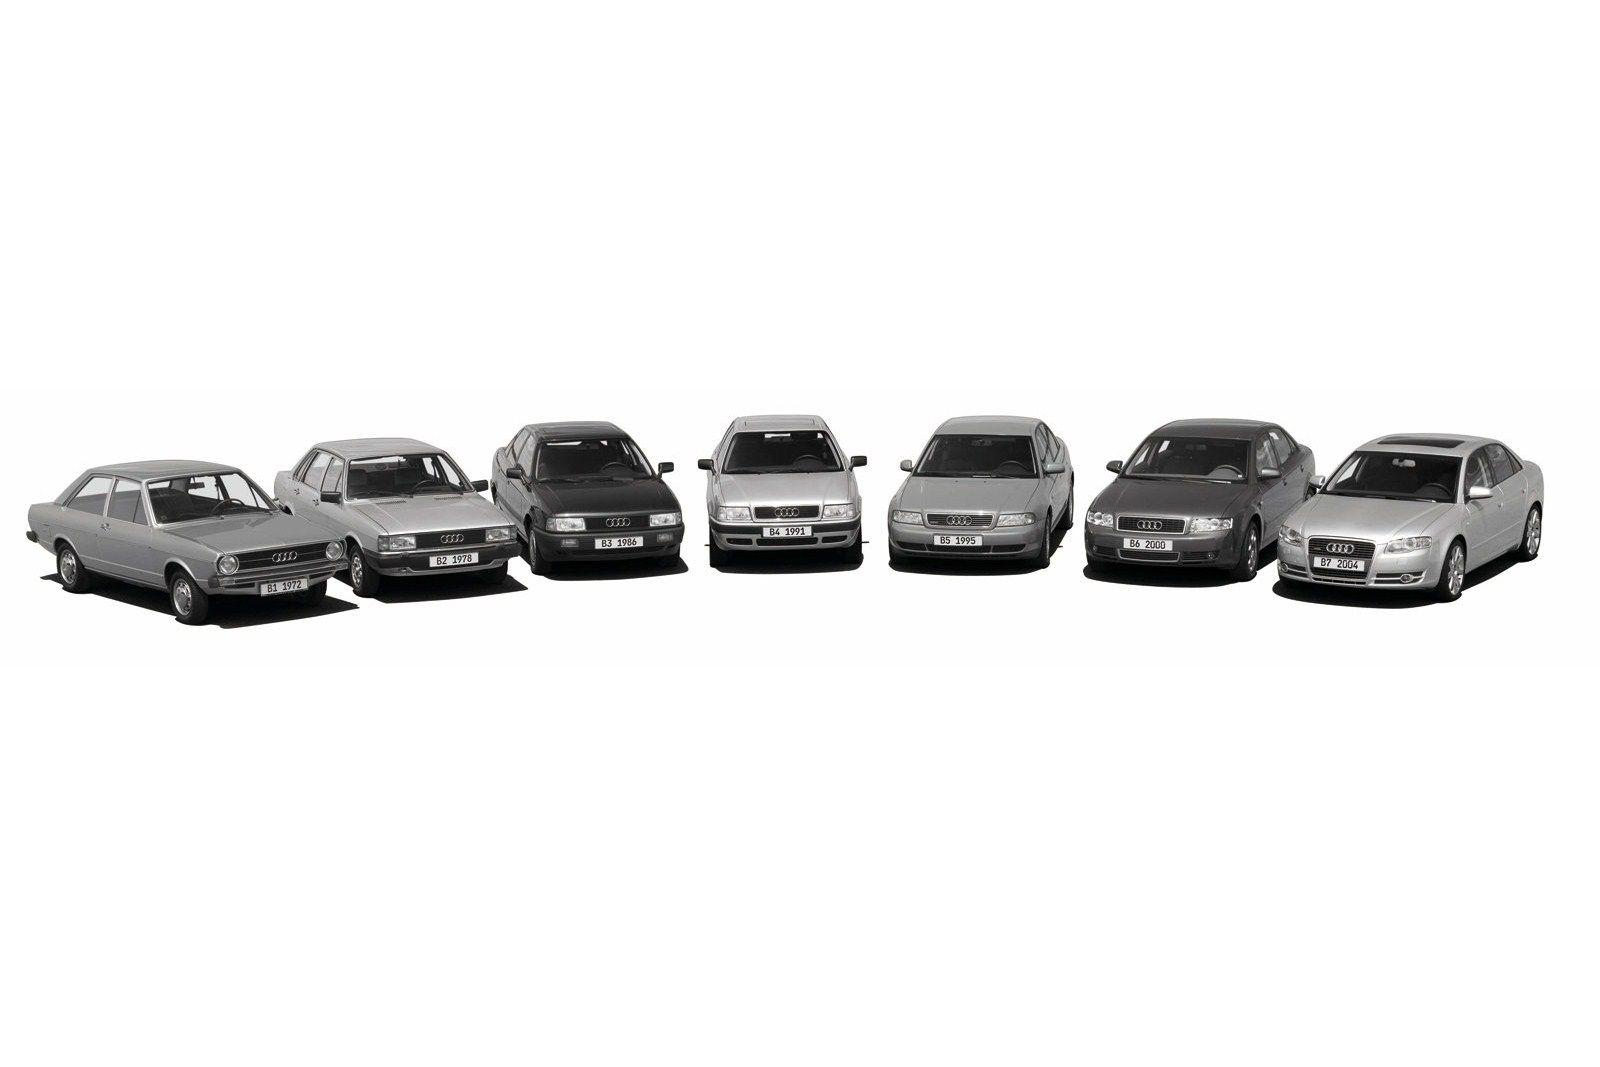 Evolution Of Audi A4 Audi Pinterest Audi Audi A4 And Automobile